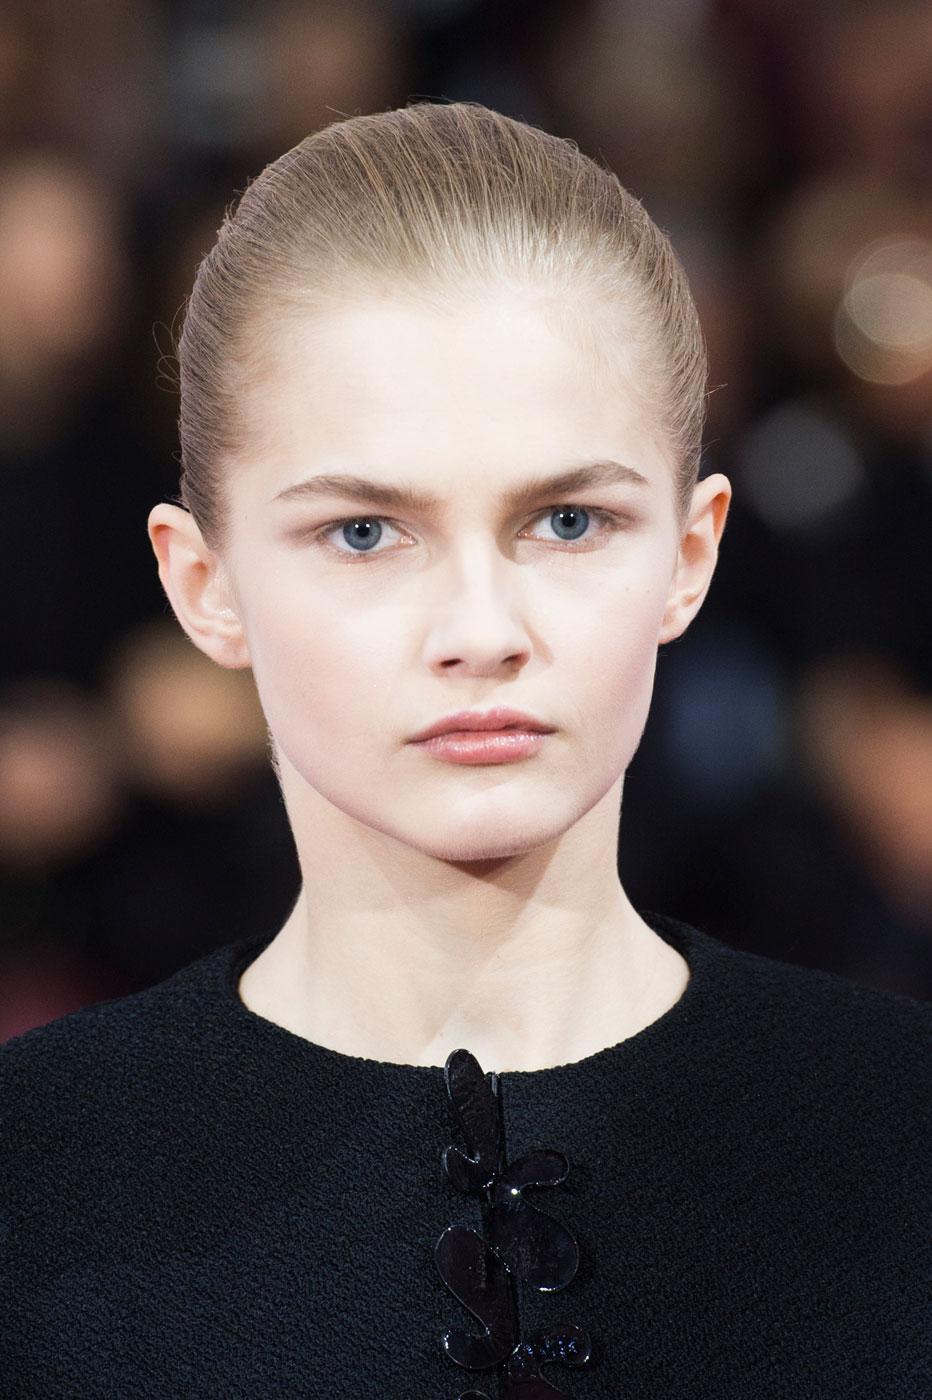 Christian-Dior-fashion-runway-show-close-ups-haute-couture-paris-spring-summer-2015-the-impression-185